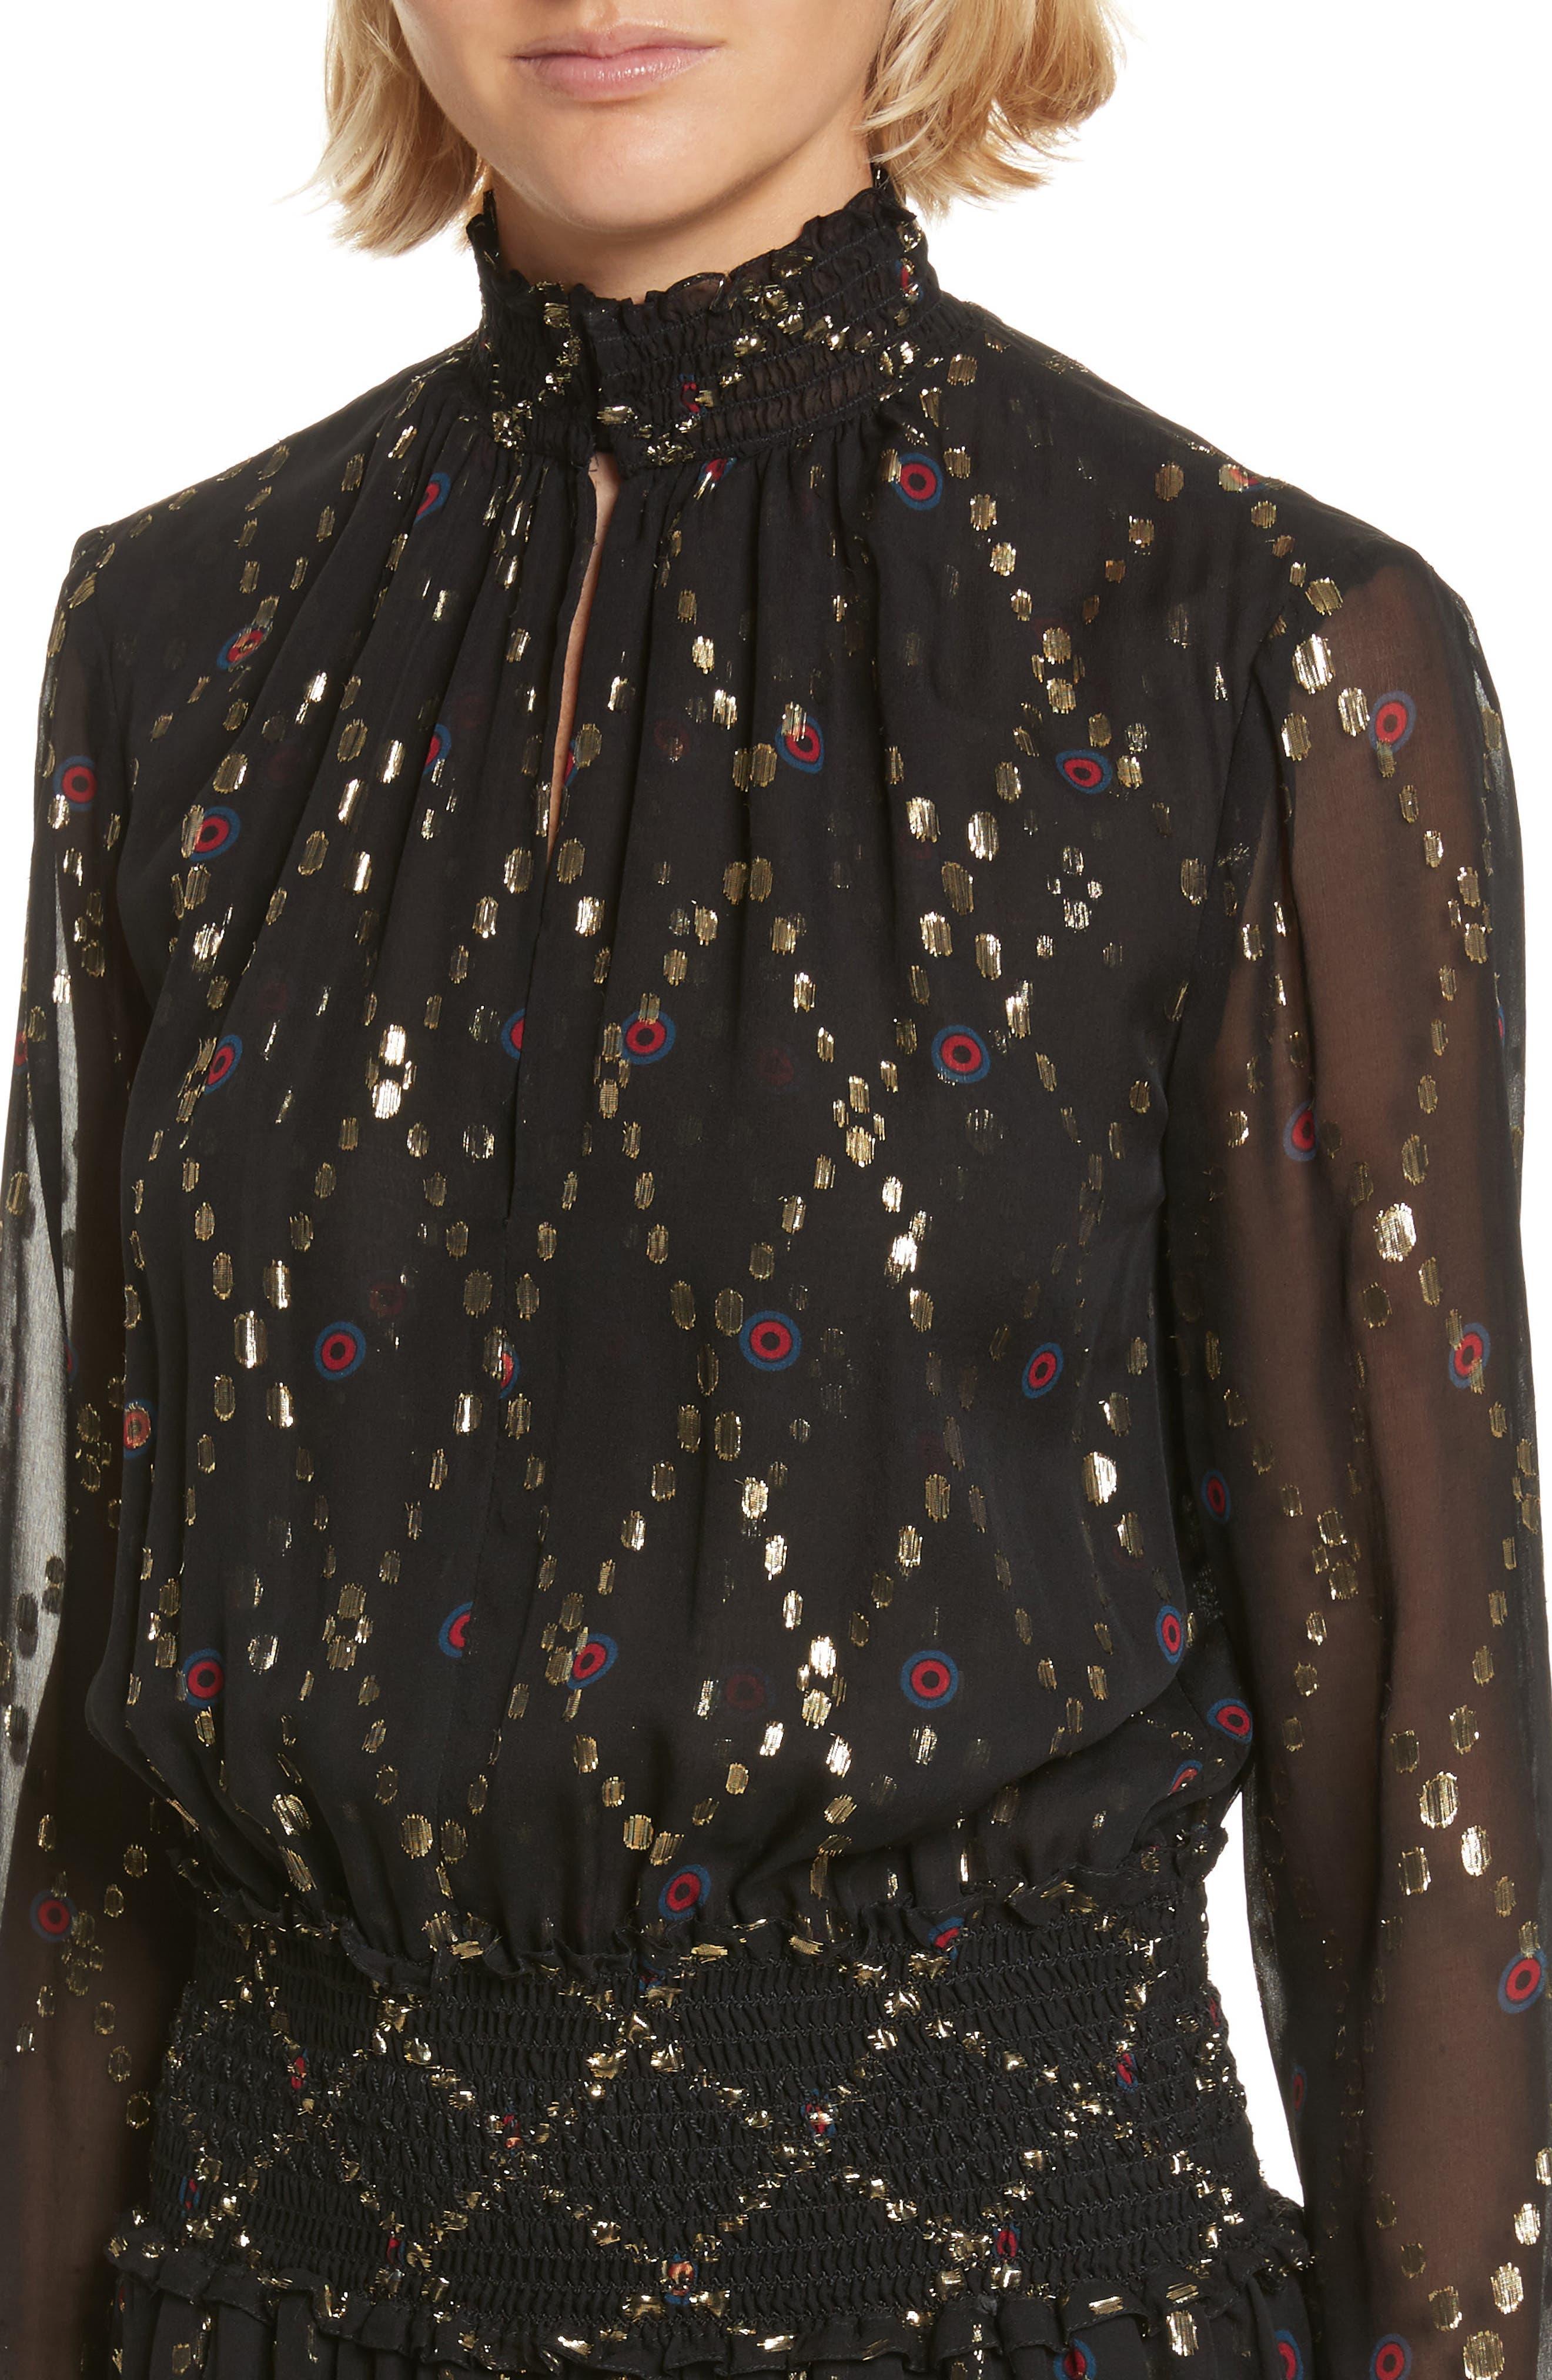 Tula Silk Dress,                             Alternate thumbnail 4, color,                             002